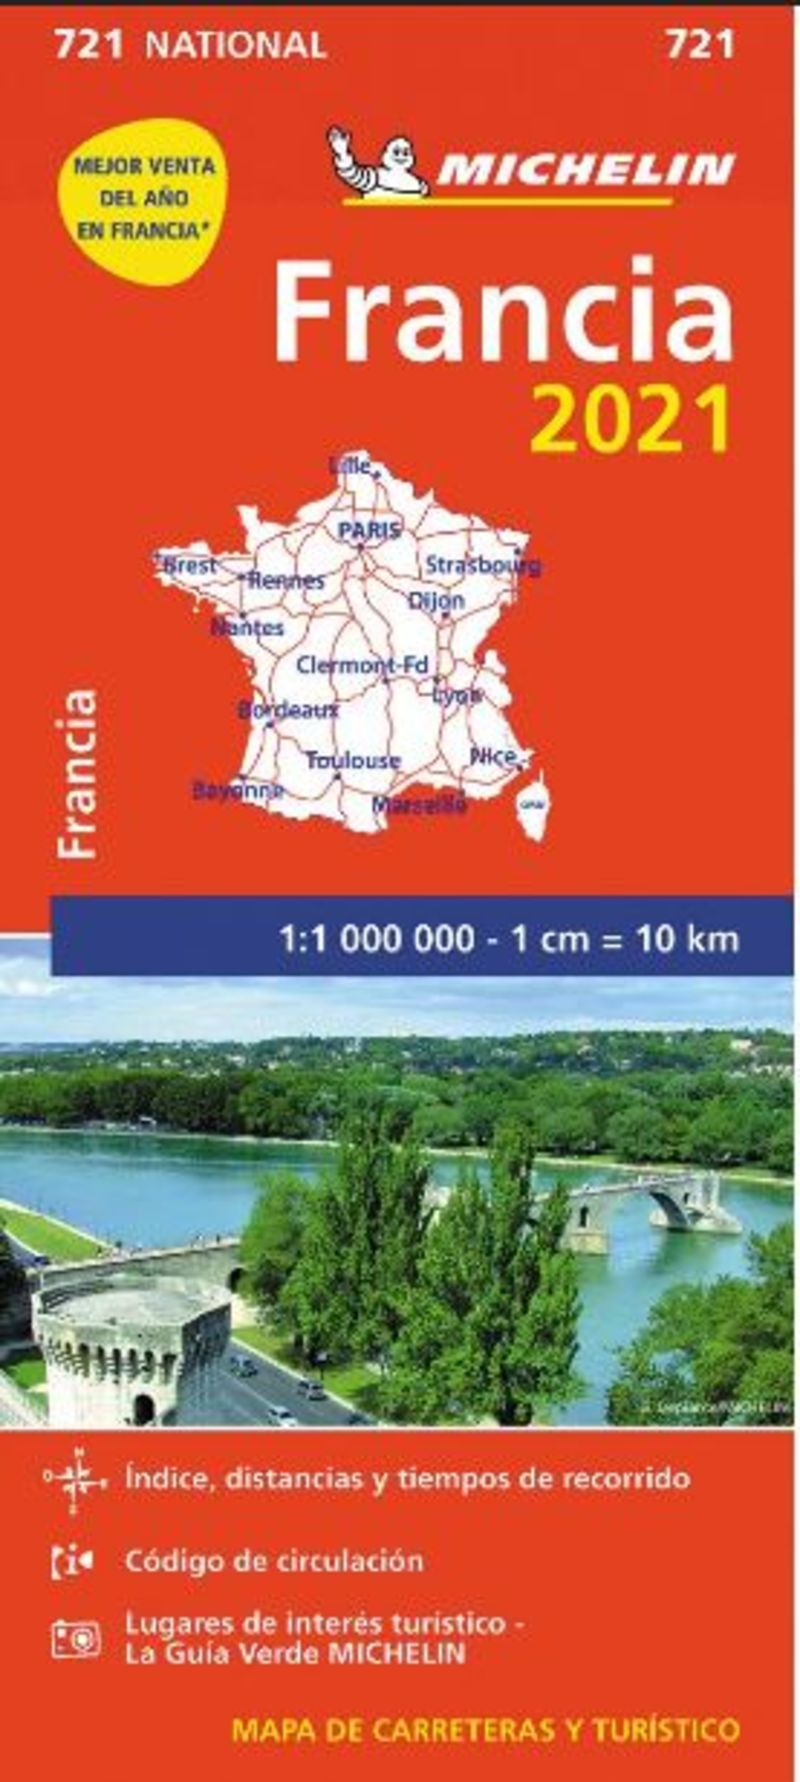 MAPA NATIONAL FRANCIA 721 (2021)